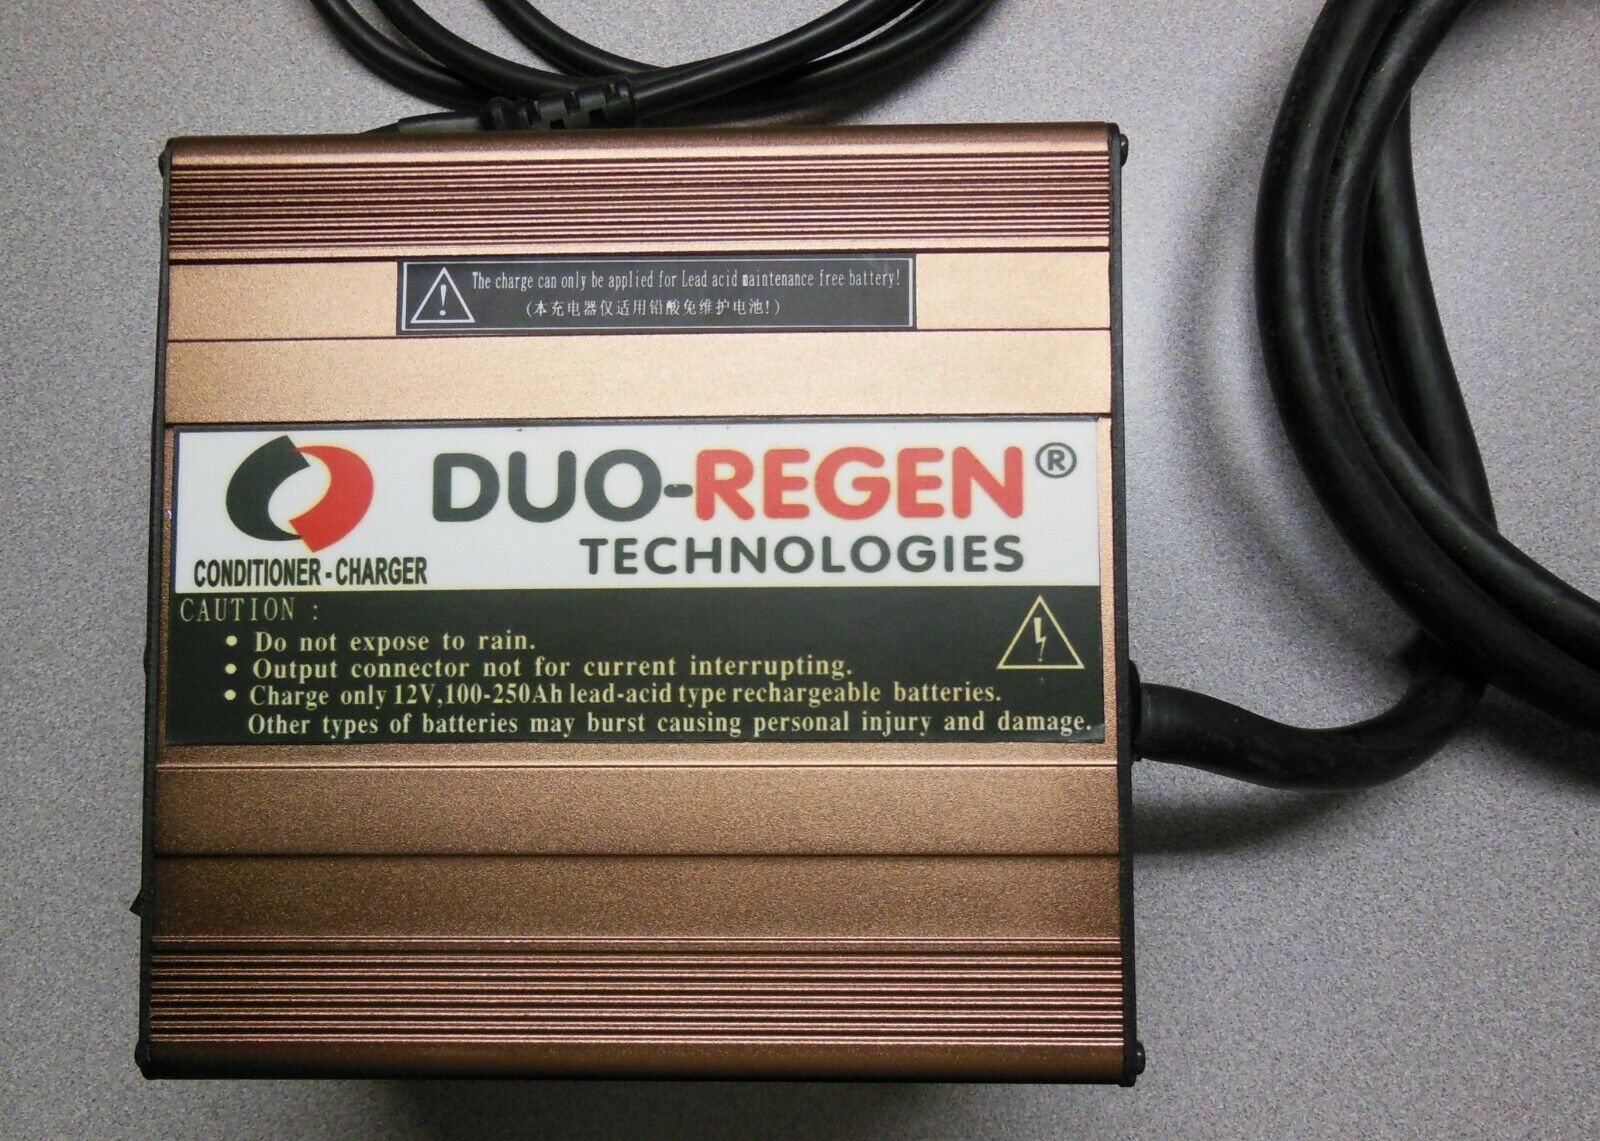 12 25A volt battery charger